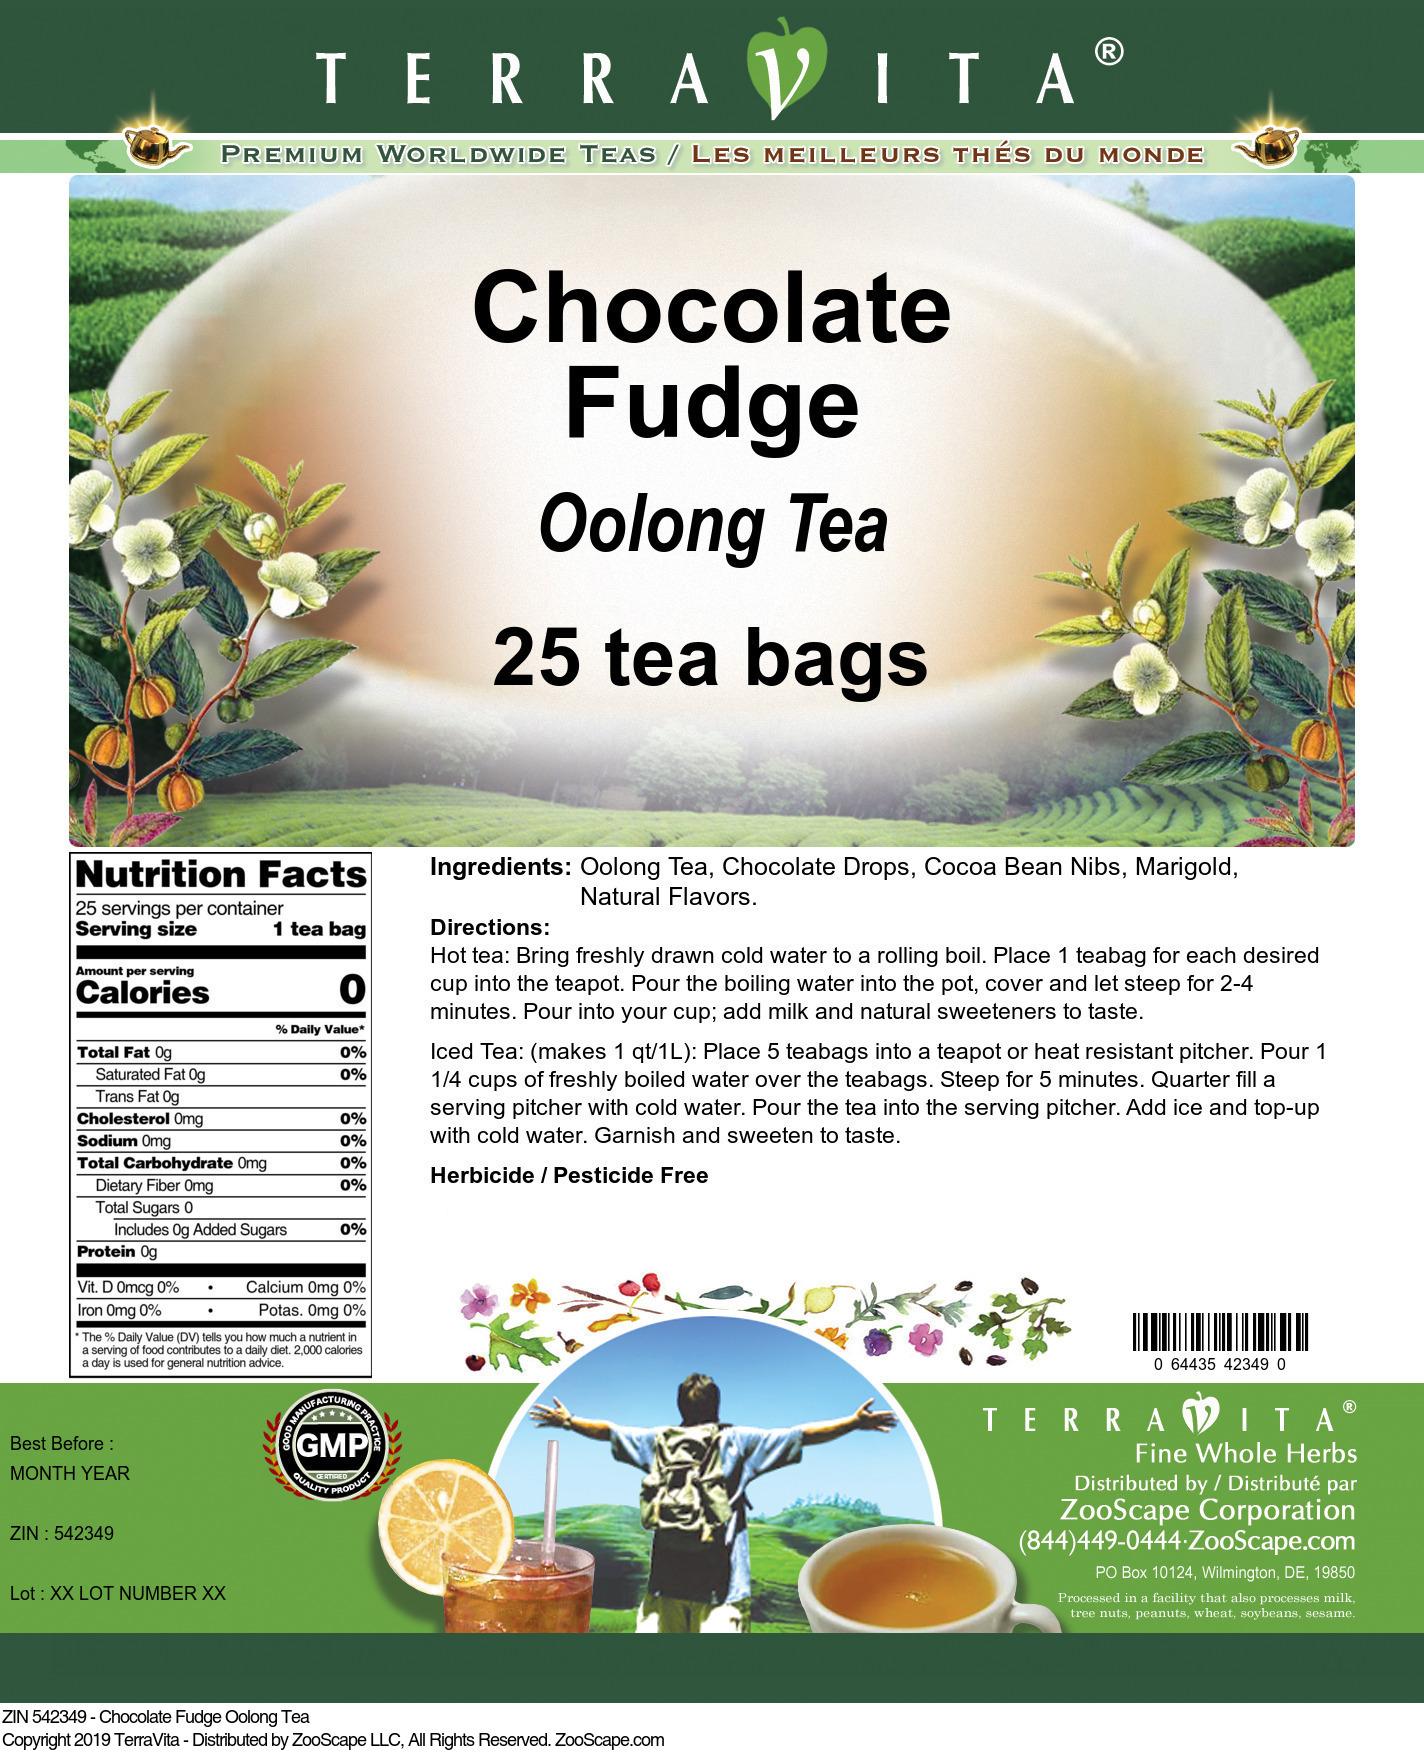 Chocolate Fudge Oolong Tea